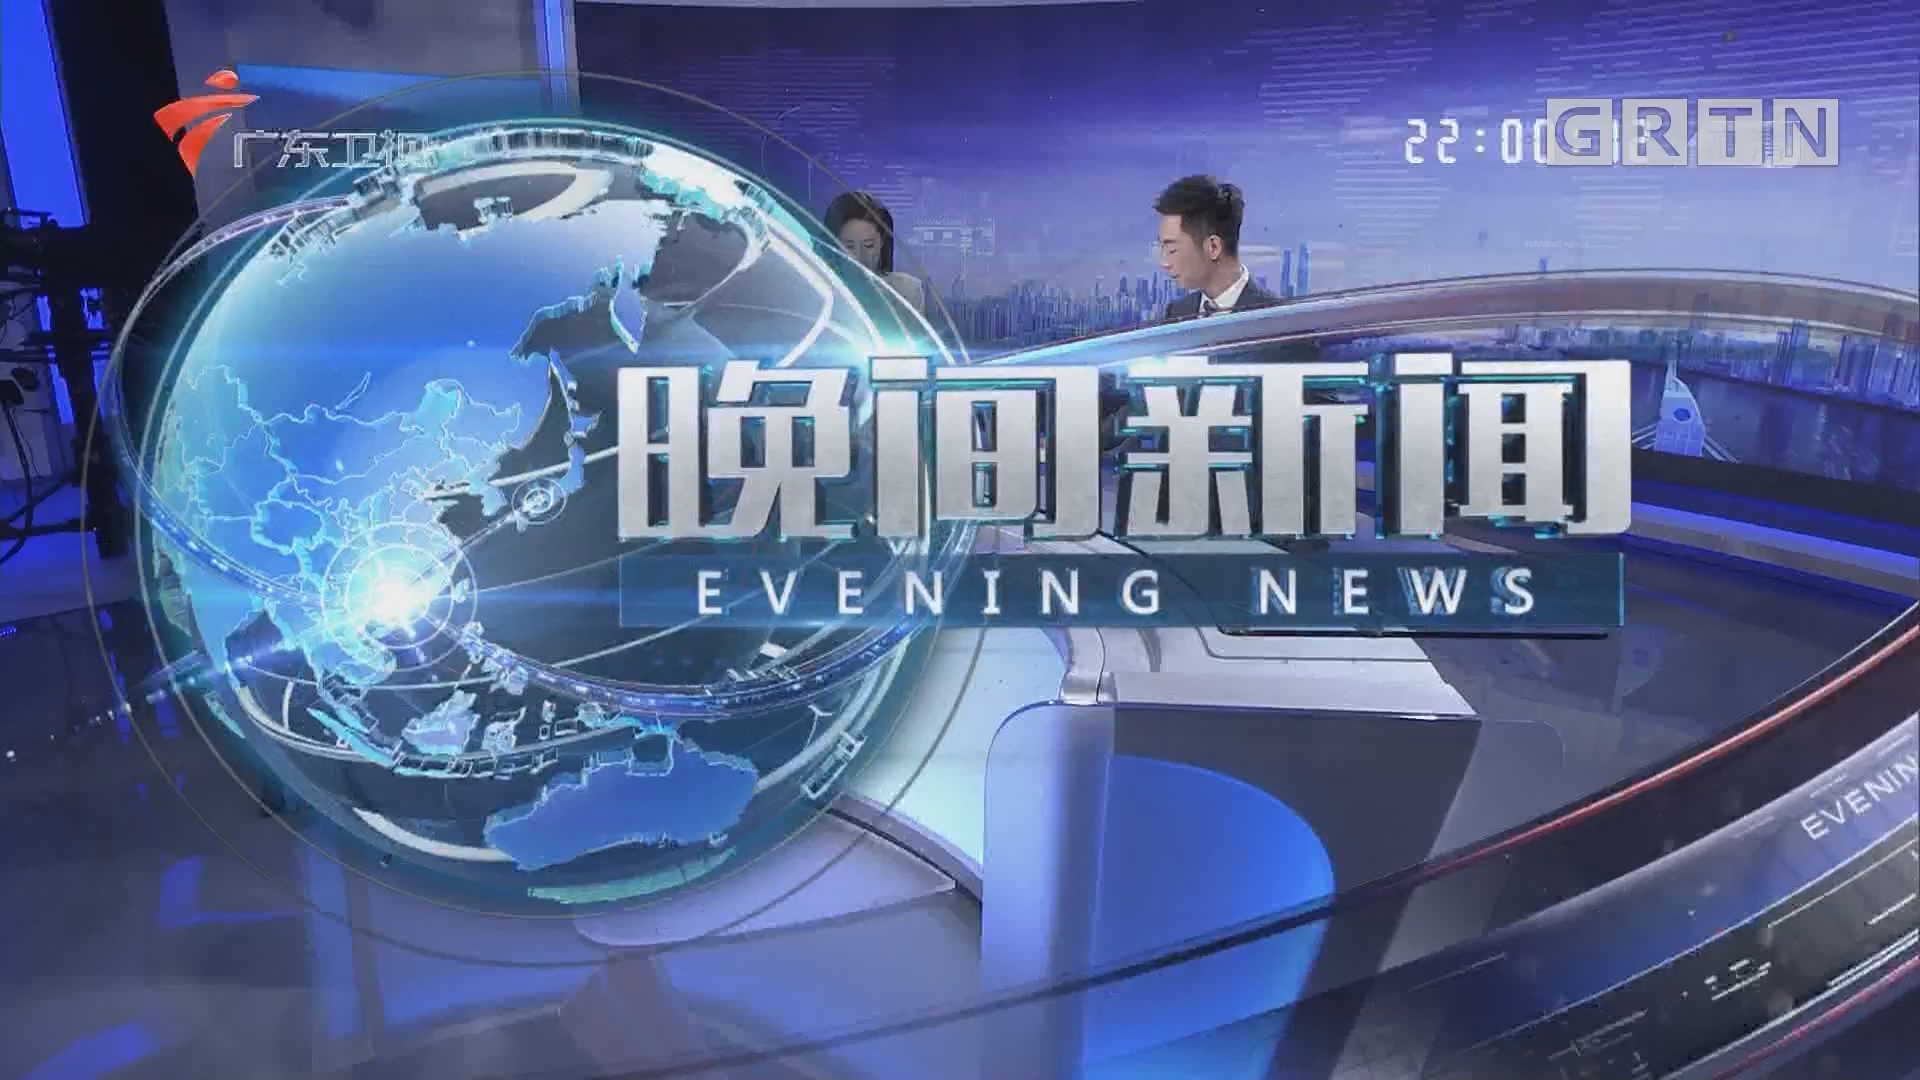 [HD][2019-11-14]晚间新闻:广州:为中小民营企业赋能 助推实体经济高质量发展 打造政策服务闭环 助力中小企业创新研发